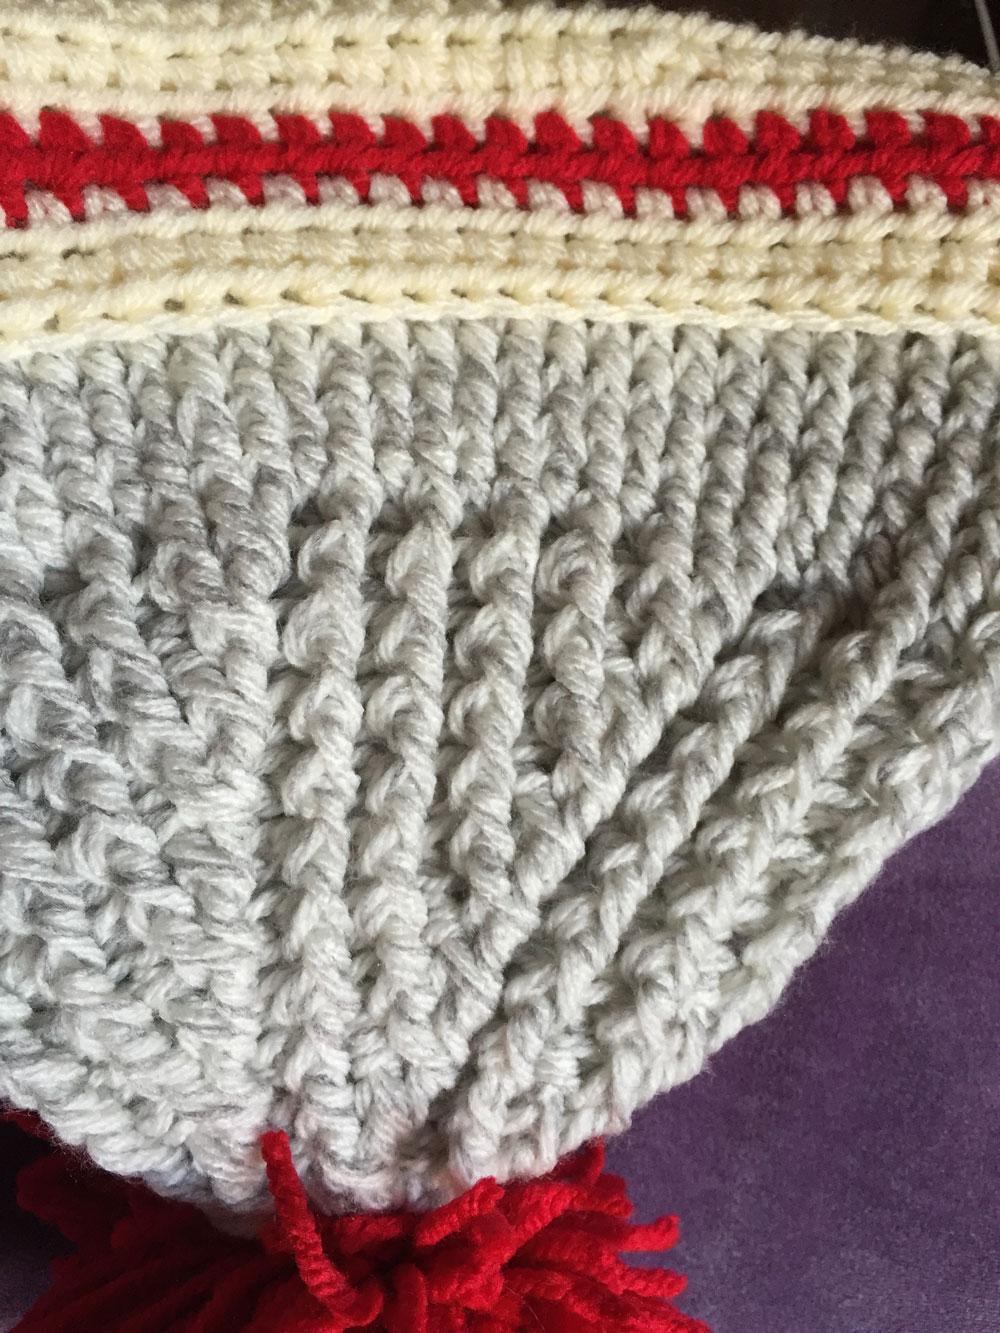 Crochet Sock Hats All Sizes Tutorial The Crochet Crowd